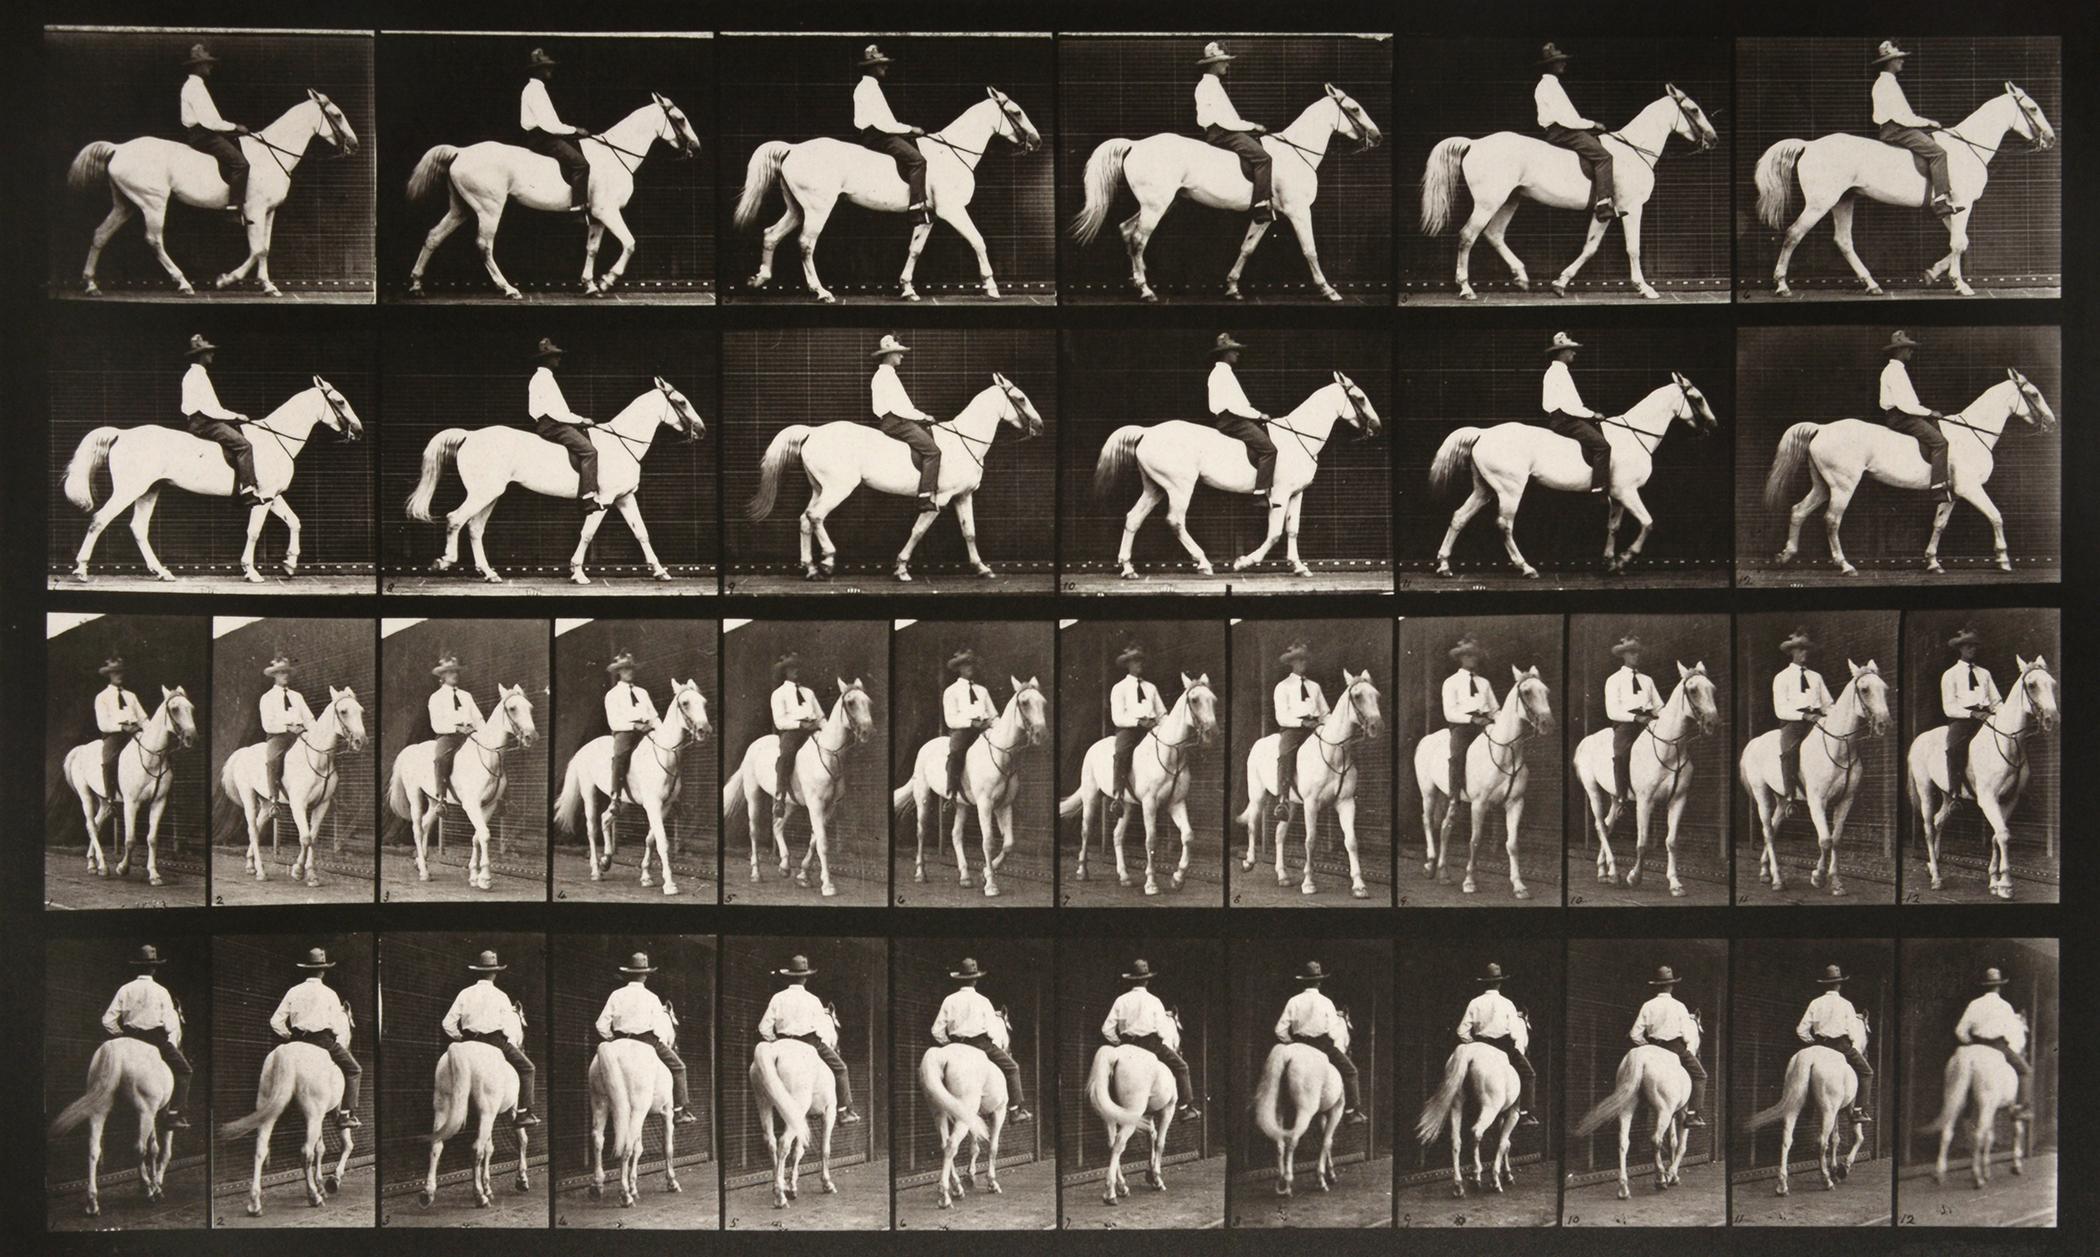 Animal Locomotion: Plate 579 (Man Riding Horse), 1887 - Eadweard Muybridge